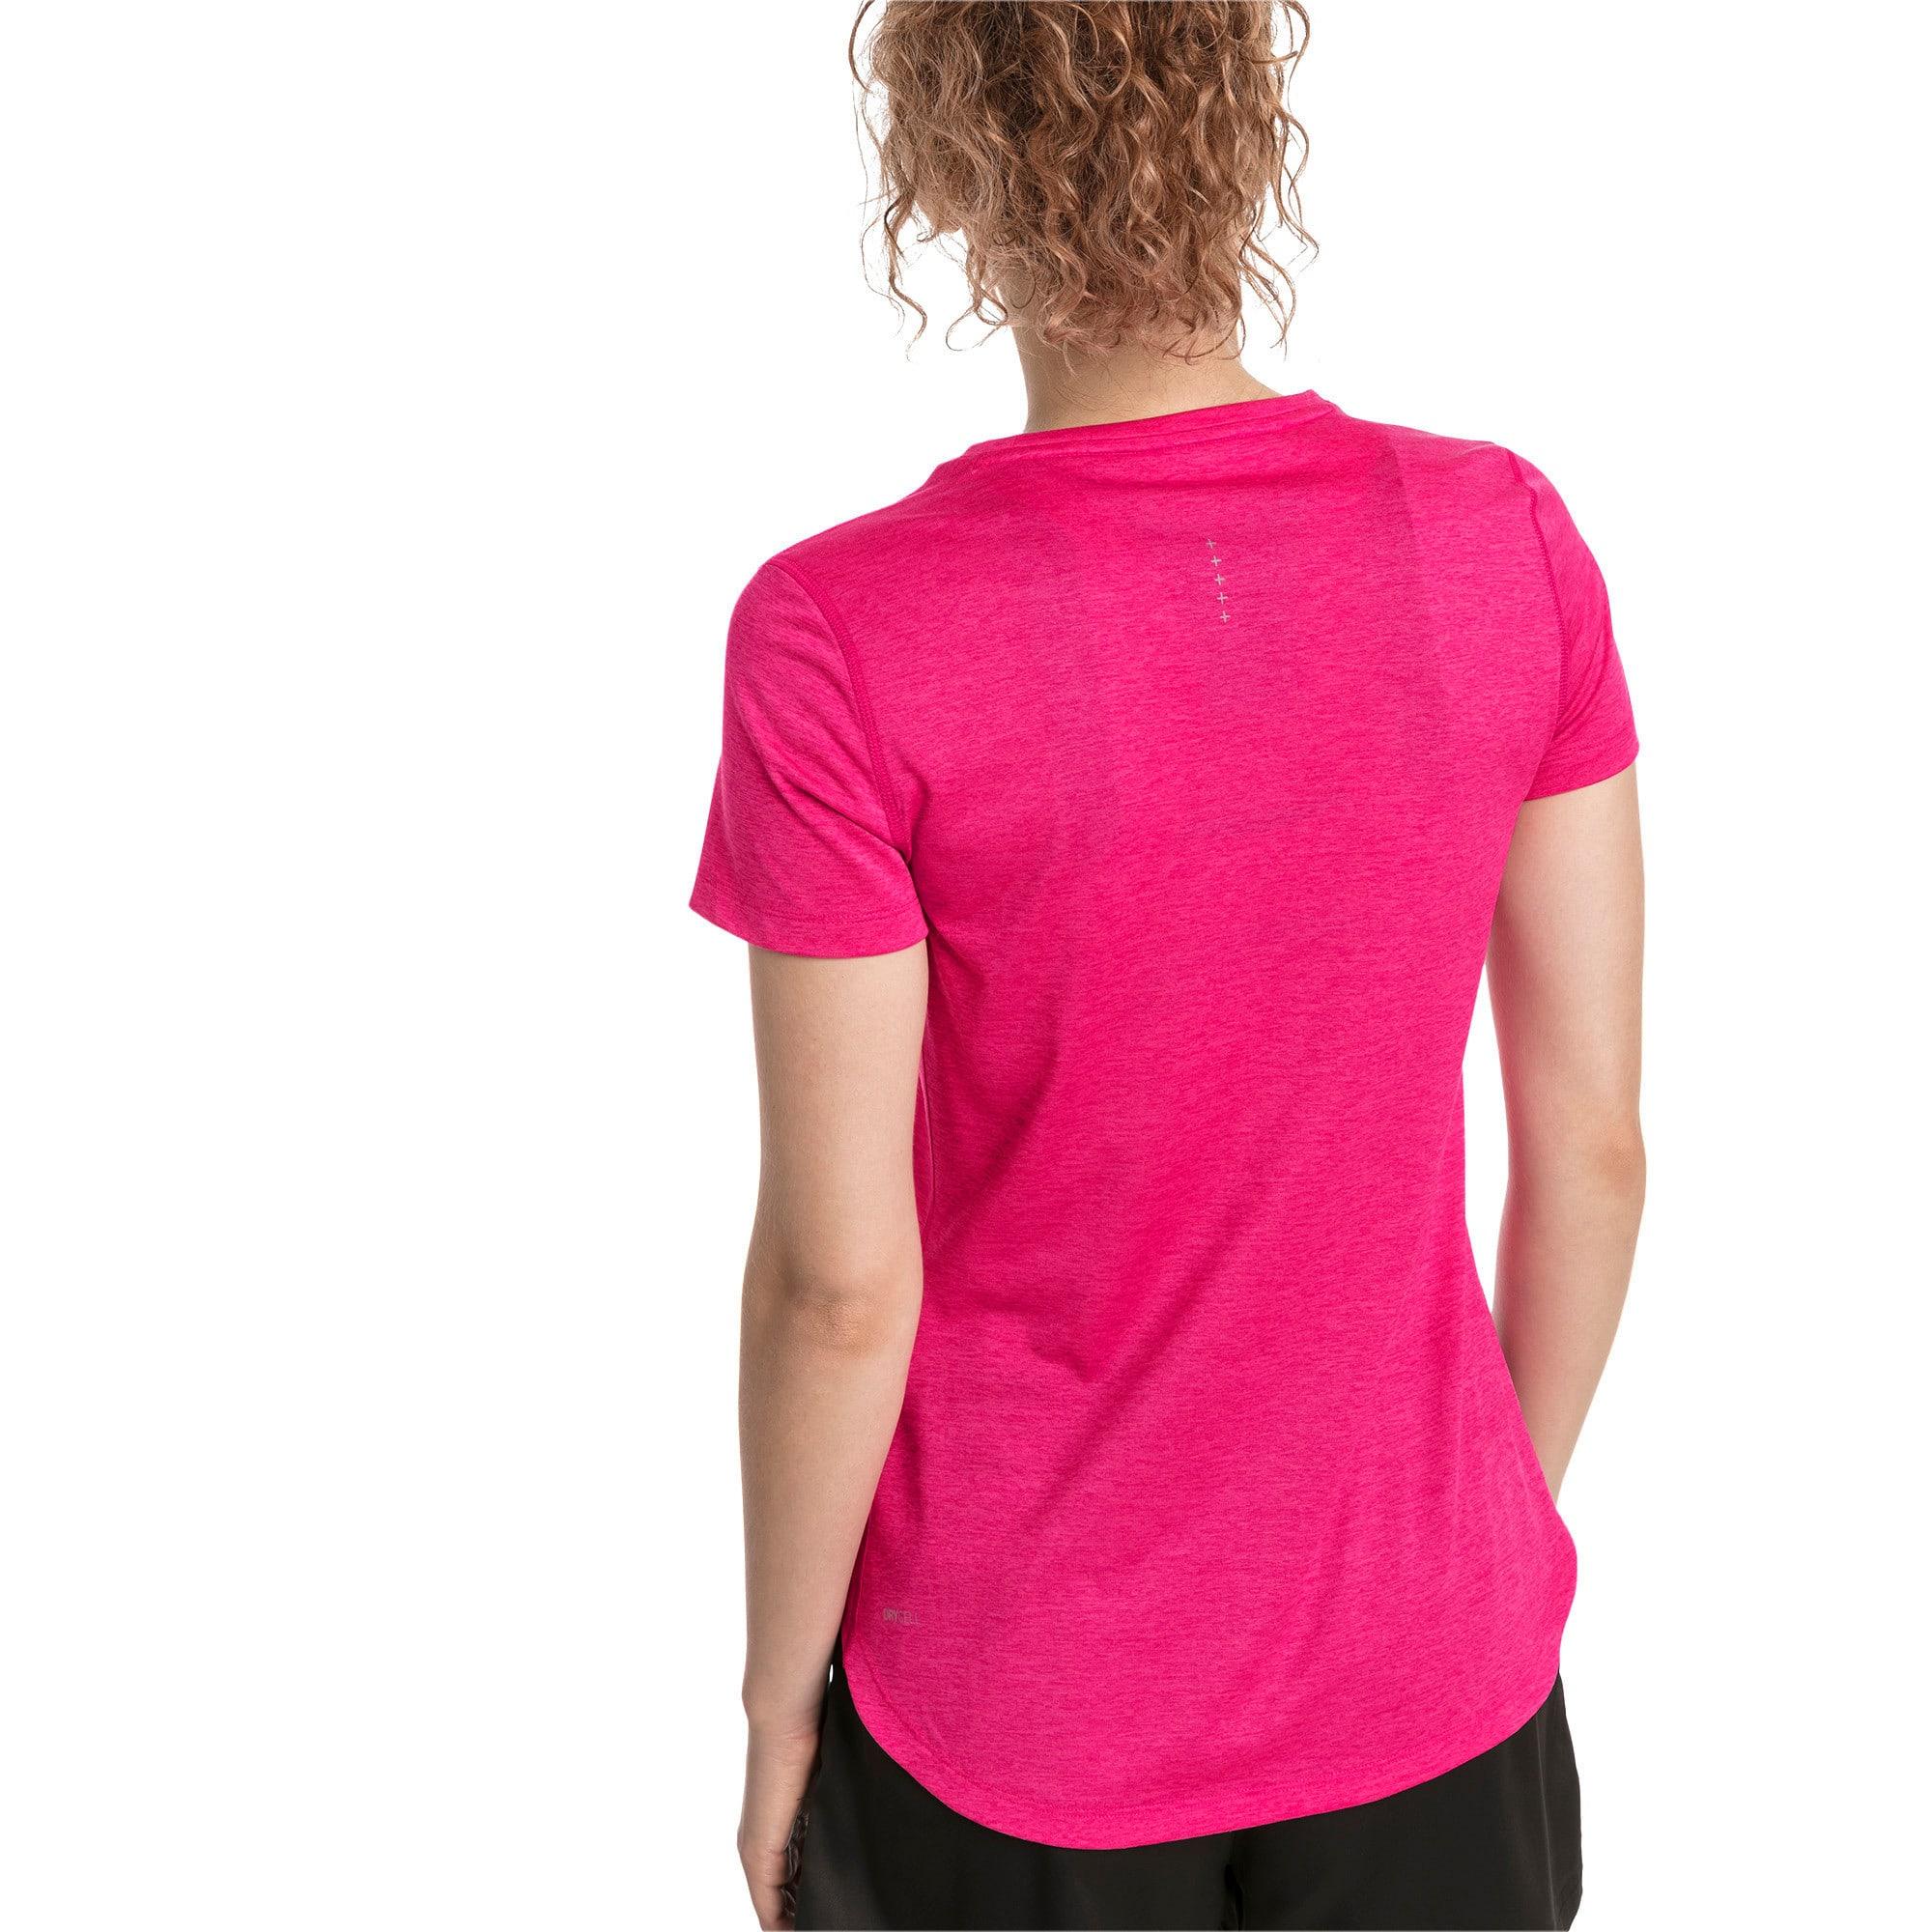 Thumbnail 2 of T-Shirt Epic Heather Running pour femme, Fuchsia Purple Heather, medium